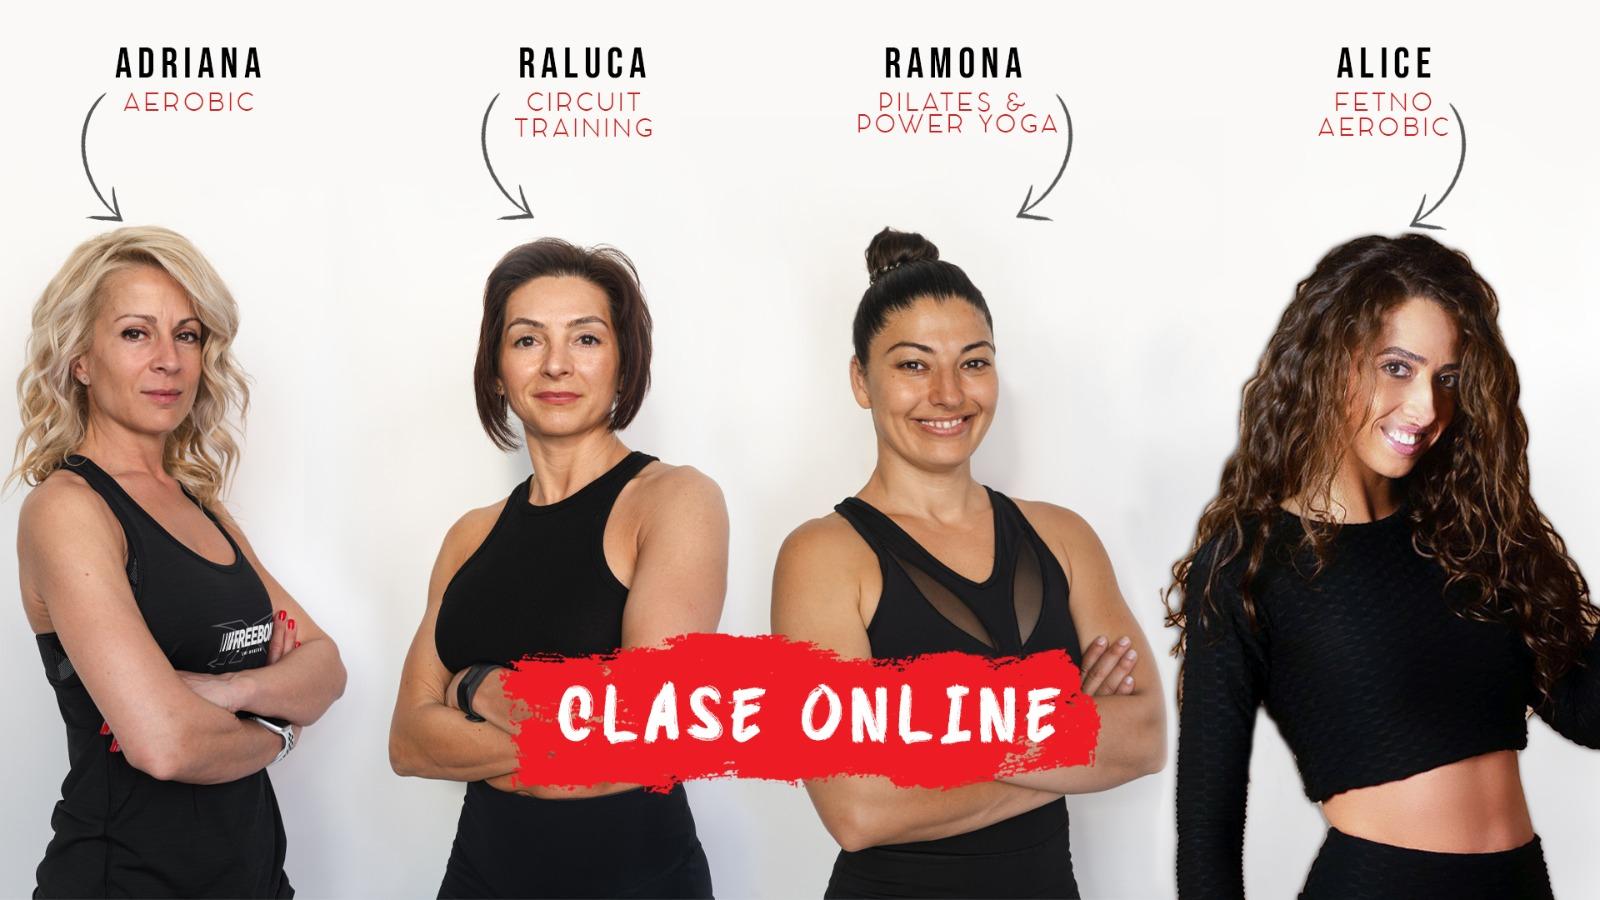 Adriana, Raluca, Ramona & Alice